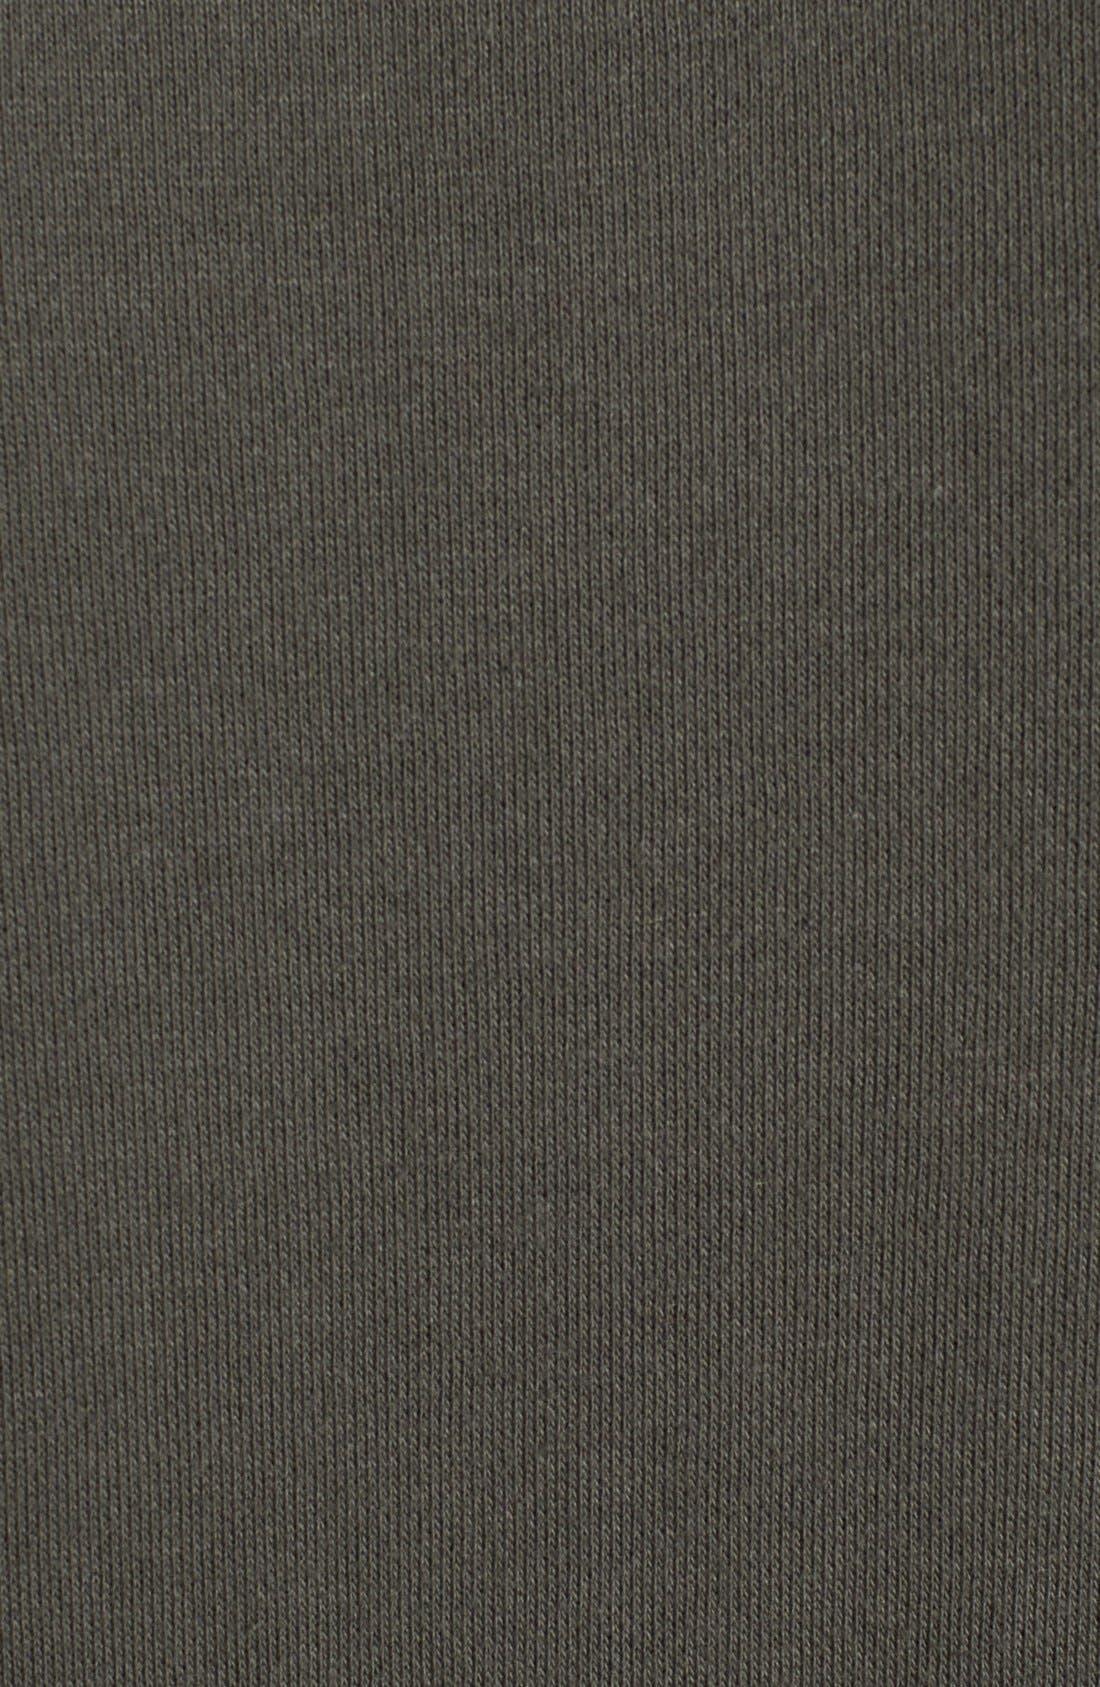 Alternate Image 3  - Original Penguin Knit Cotton Jacket